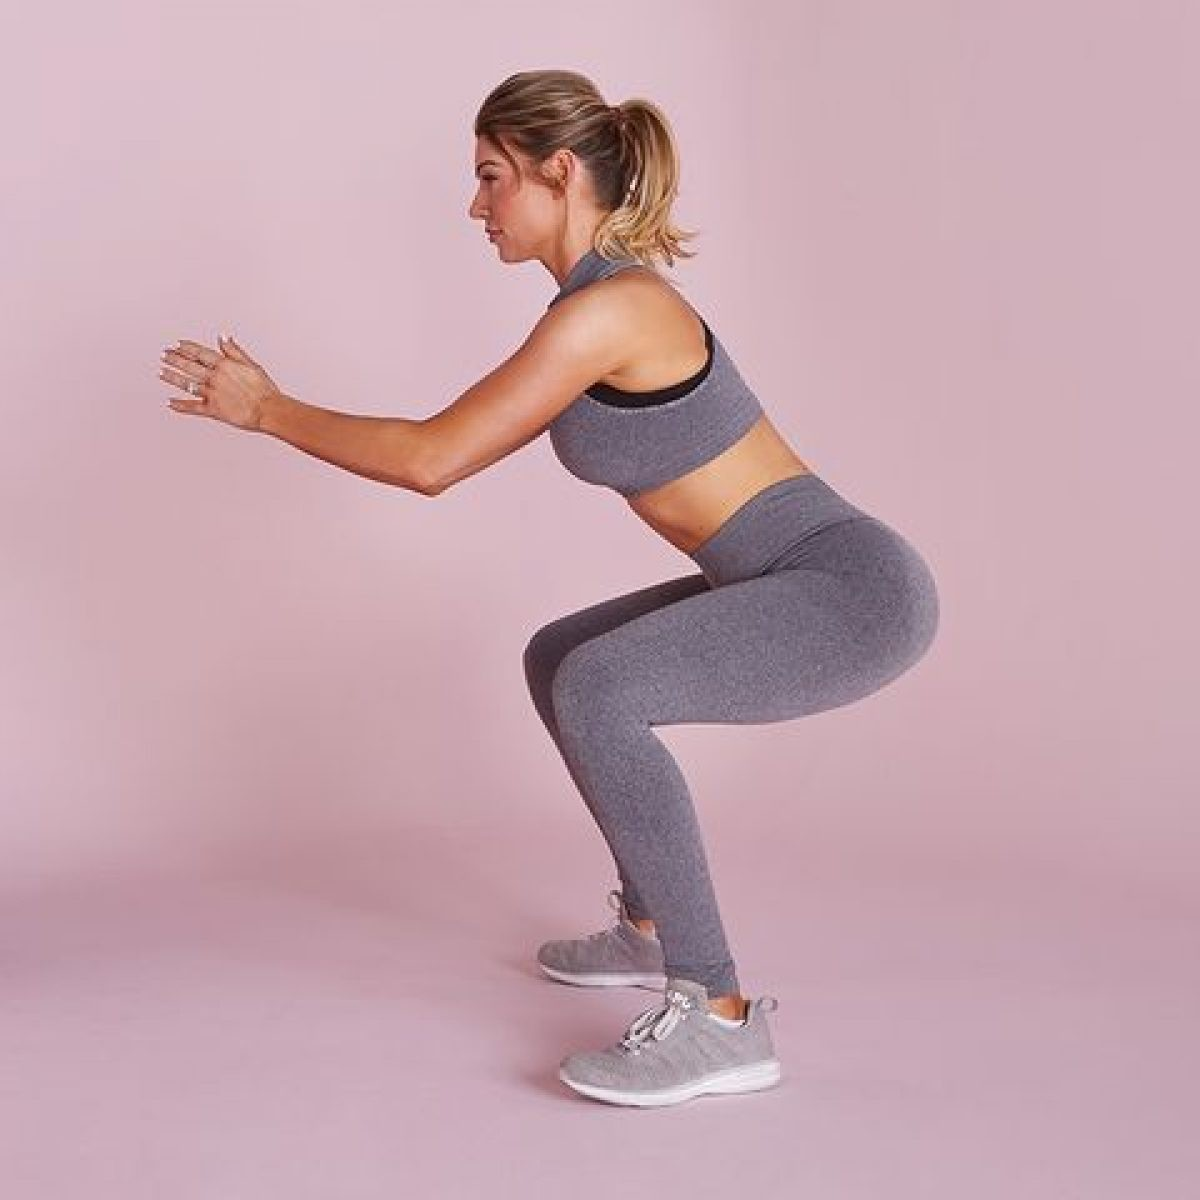 anna-victoria-squat-1548705288-1200x1200.jpg